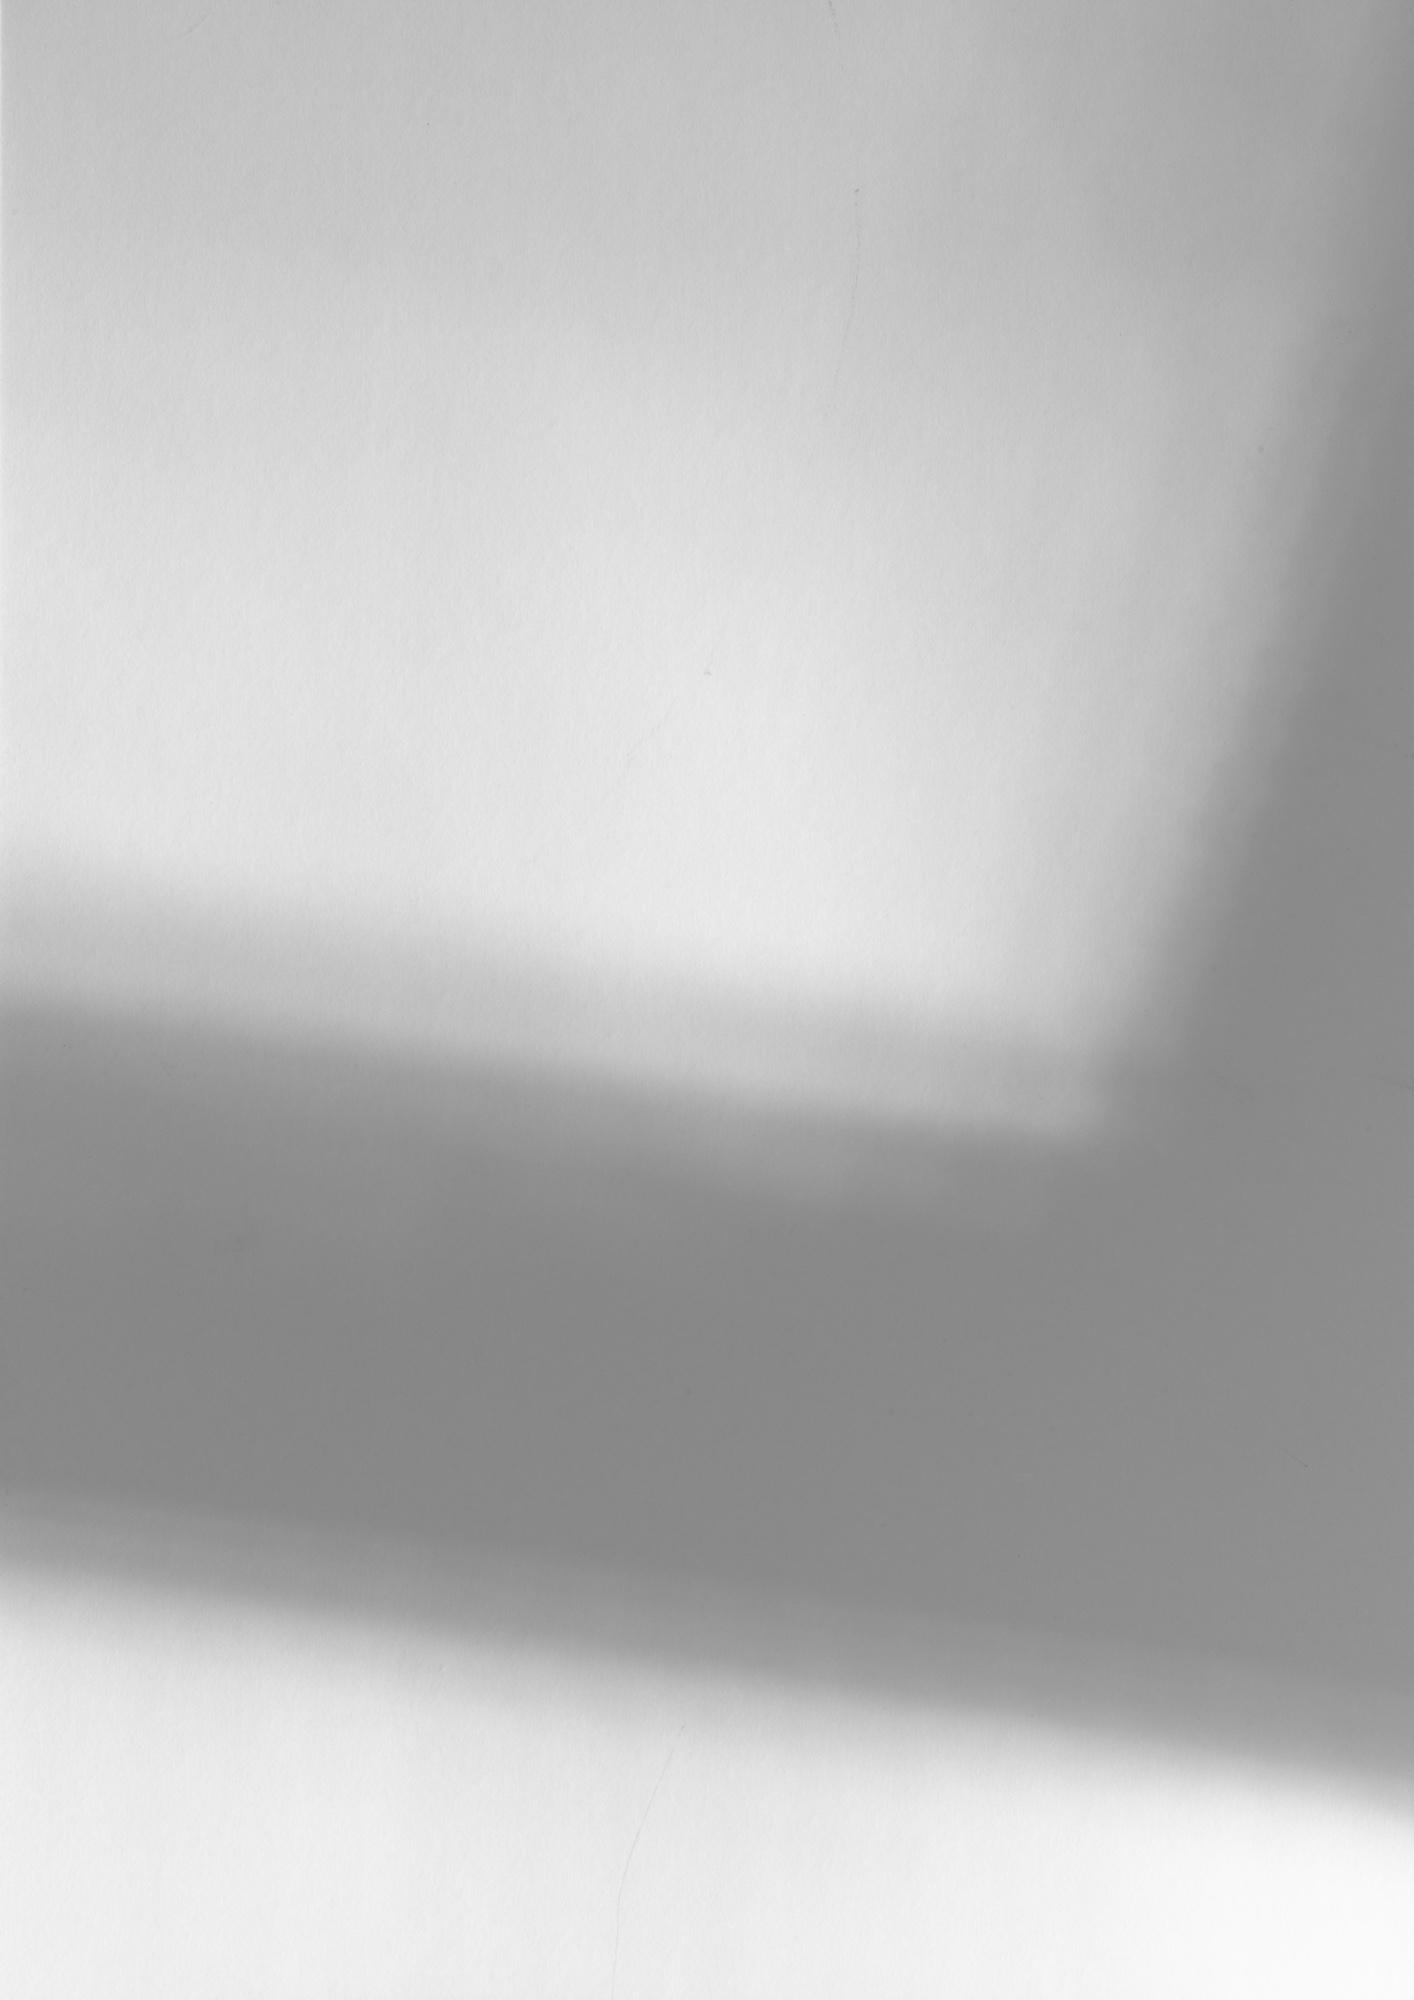 L1010140.jpg